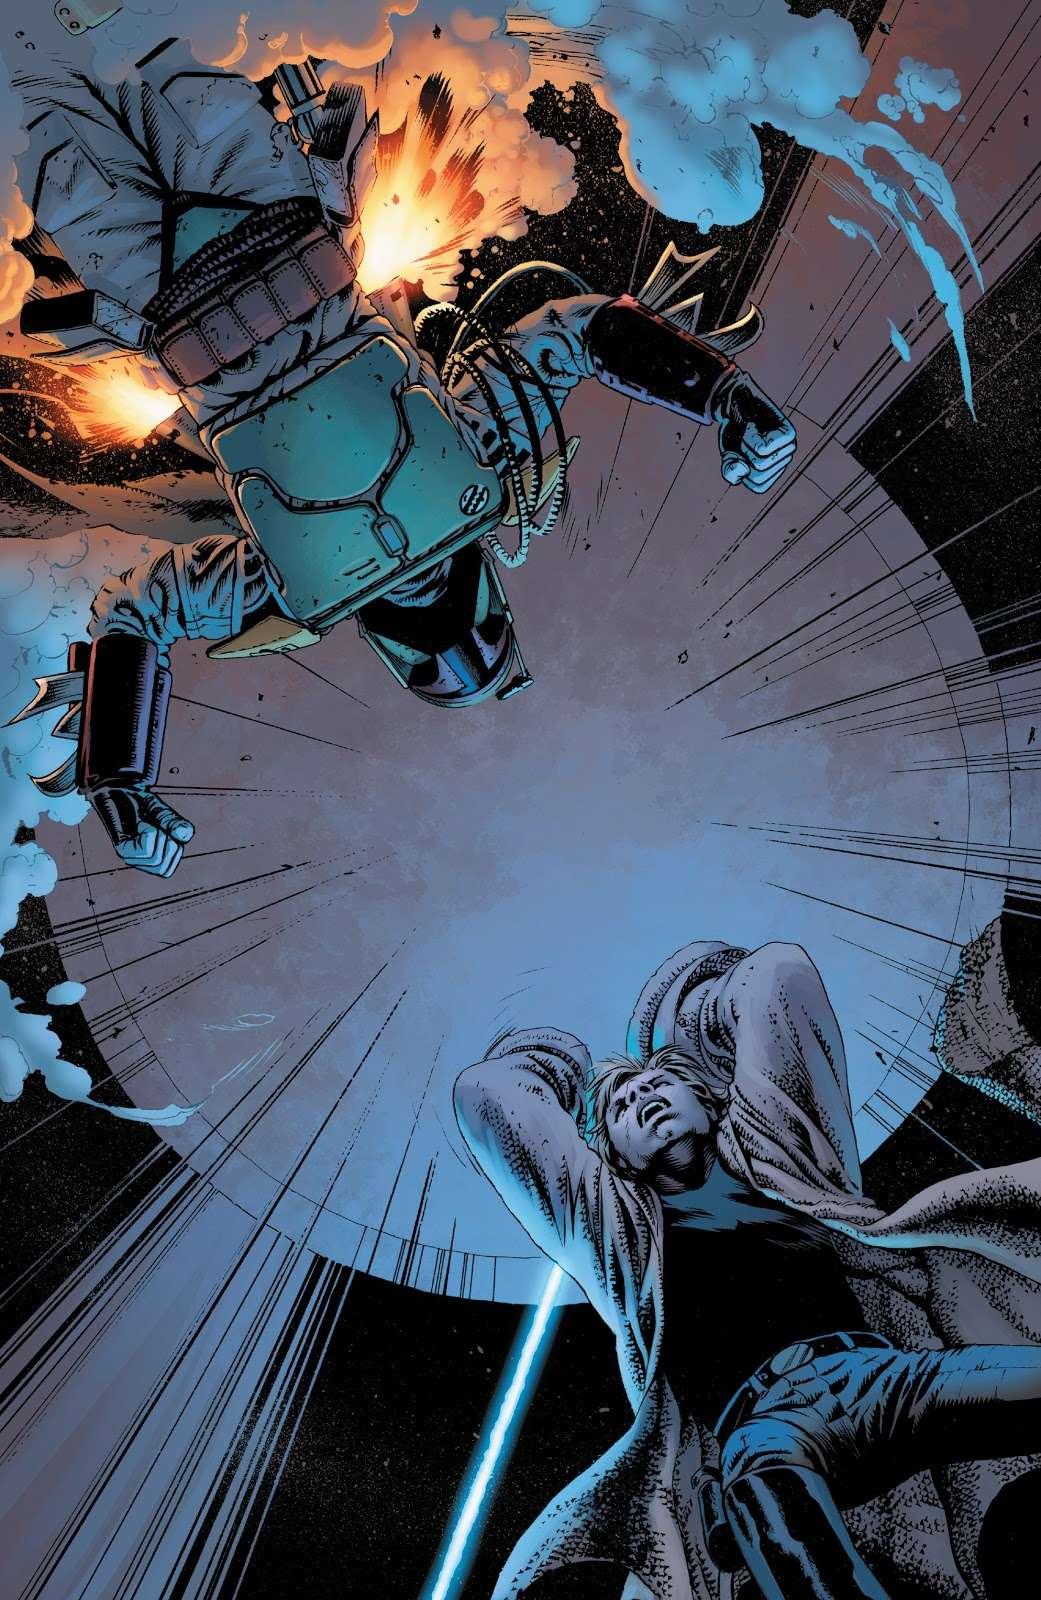 , Un fumetto anticipa la serie TV su Kenobi?, Star Wars Addicted